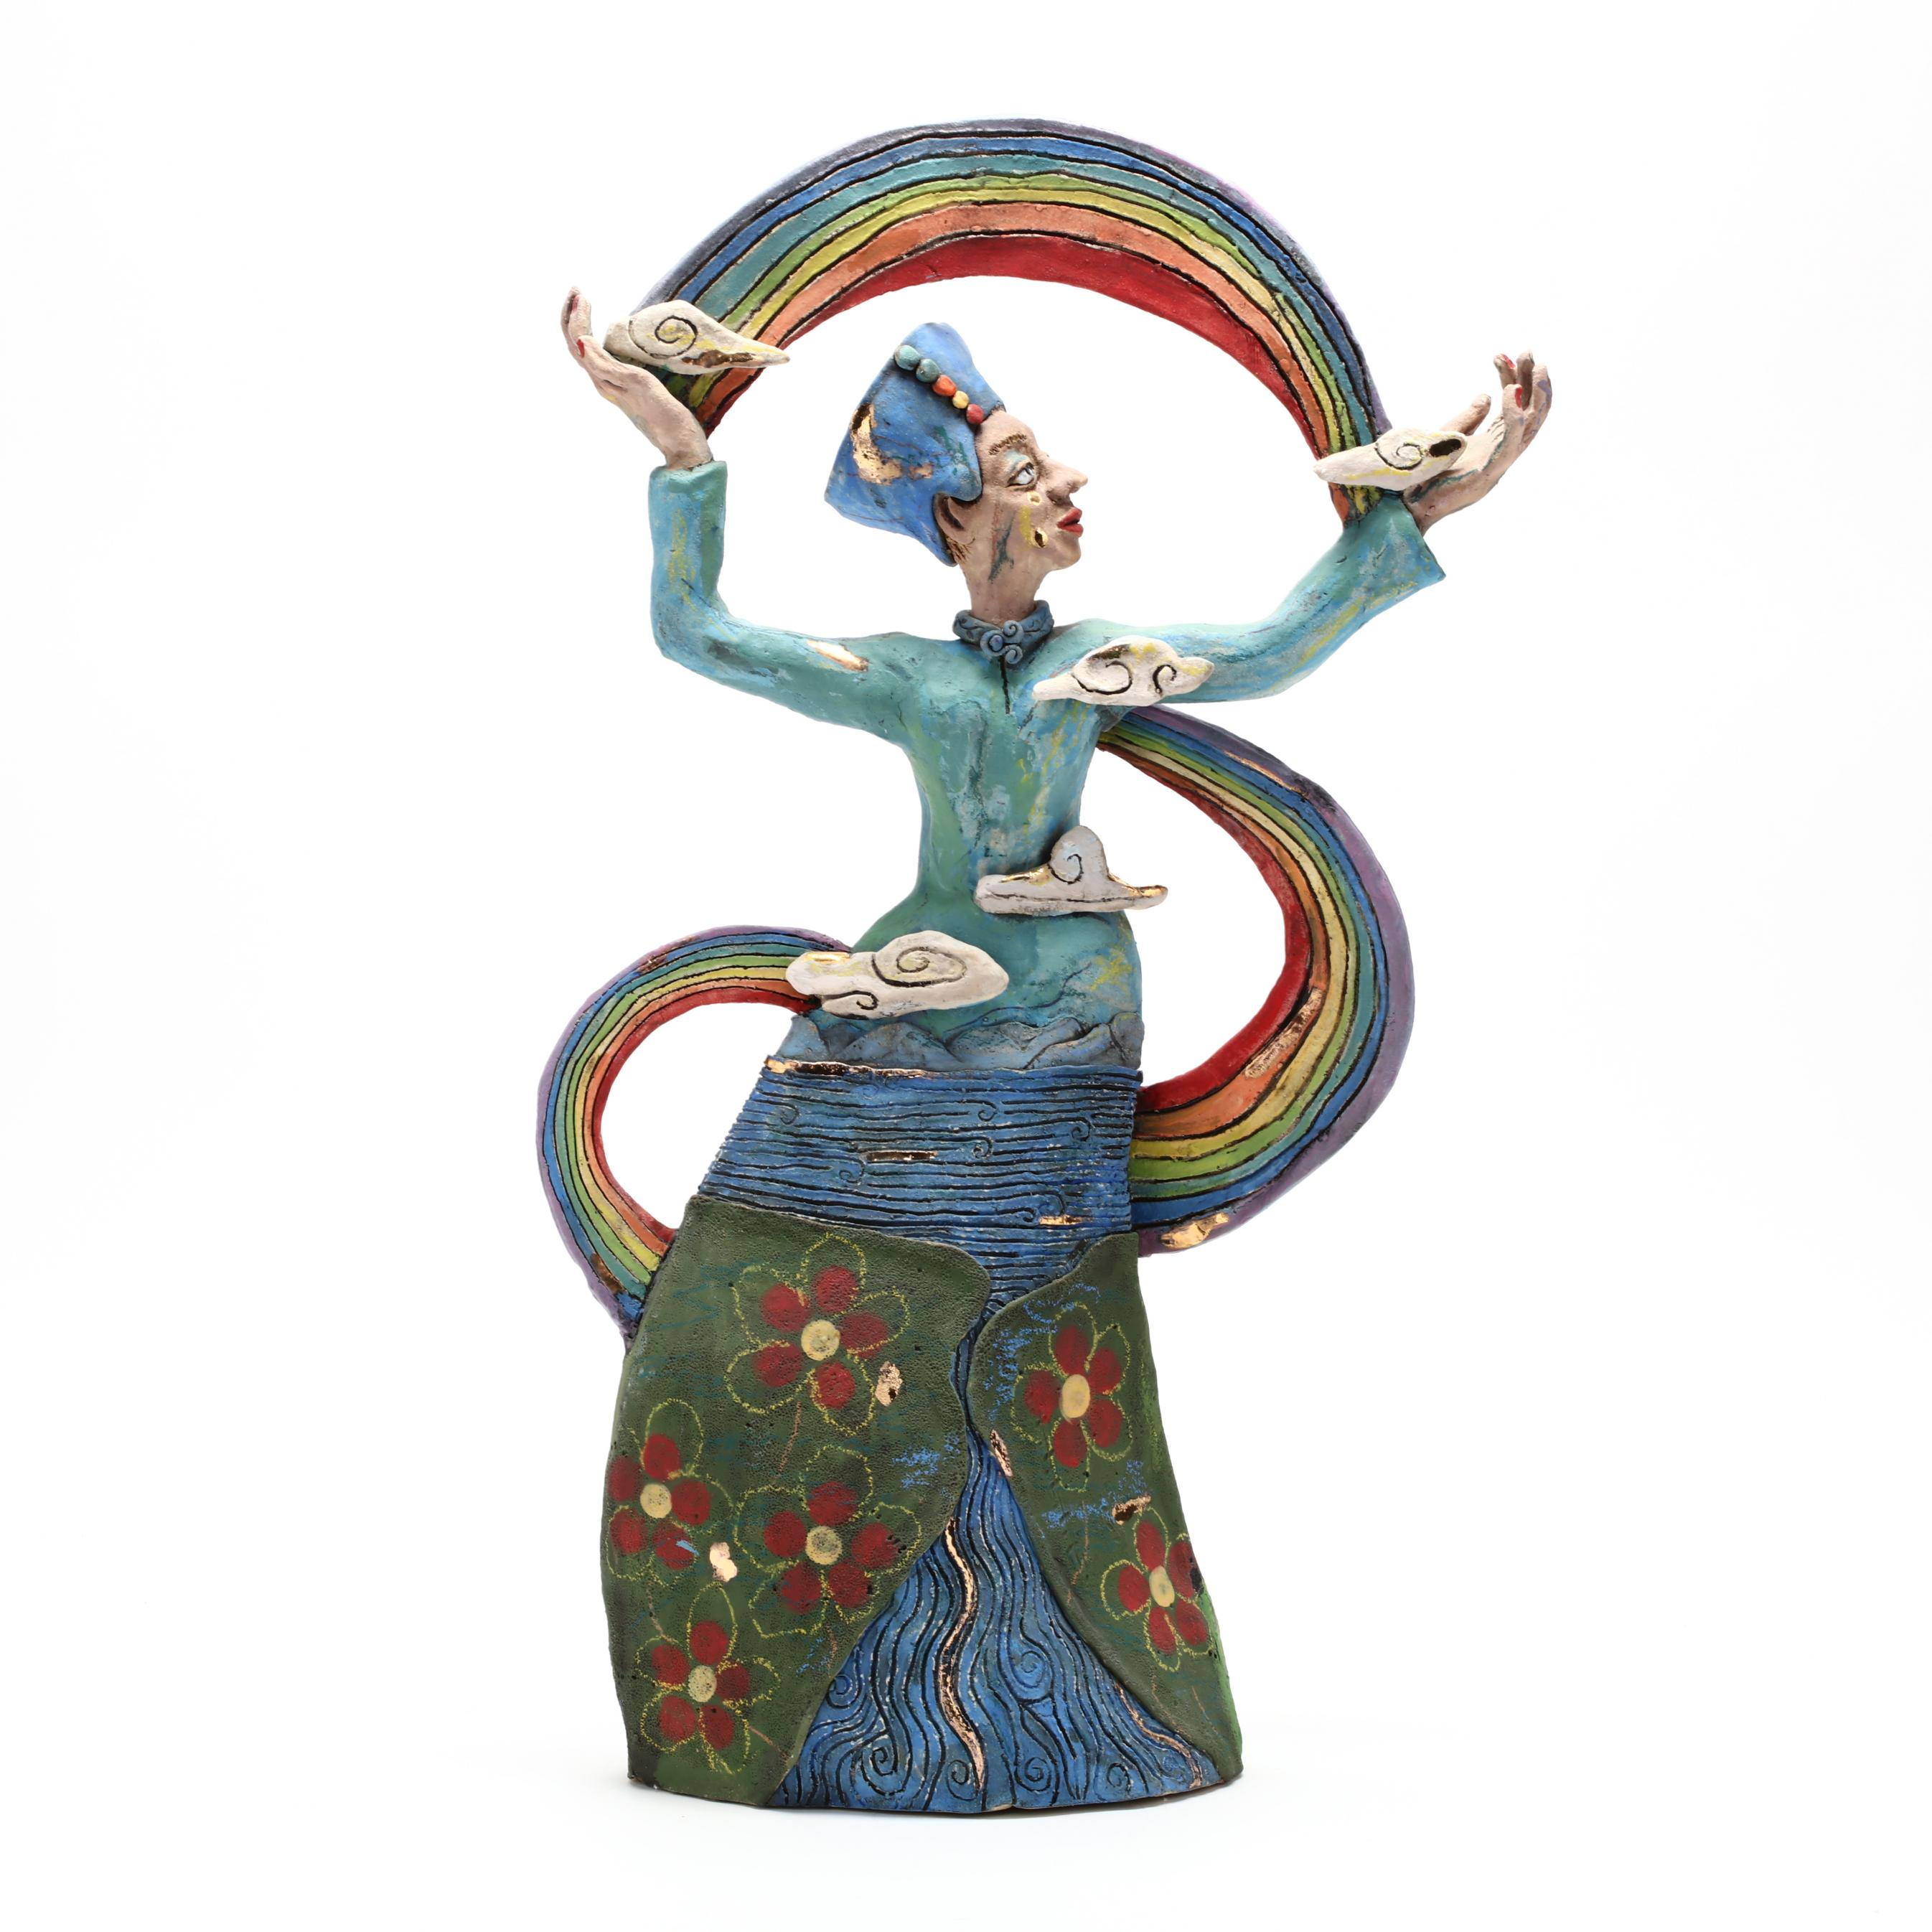 att-justine-ferreri-nc-woman-with-rainbows